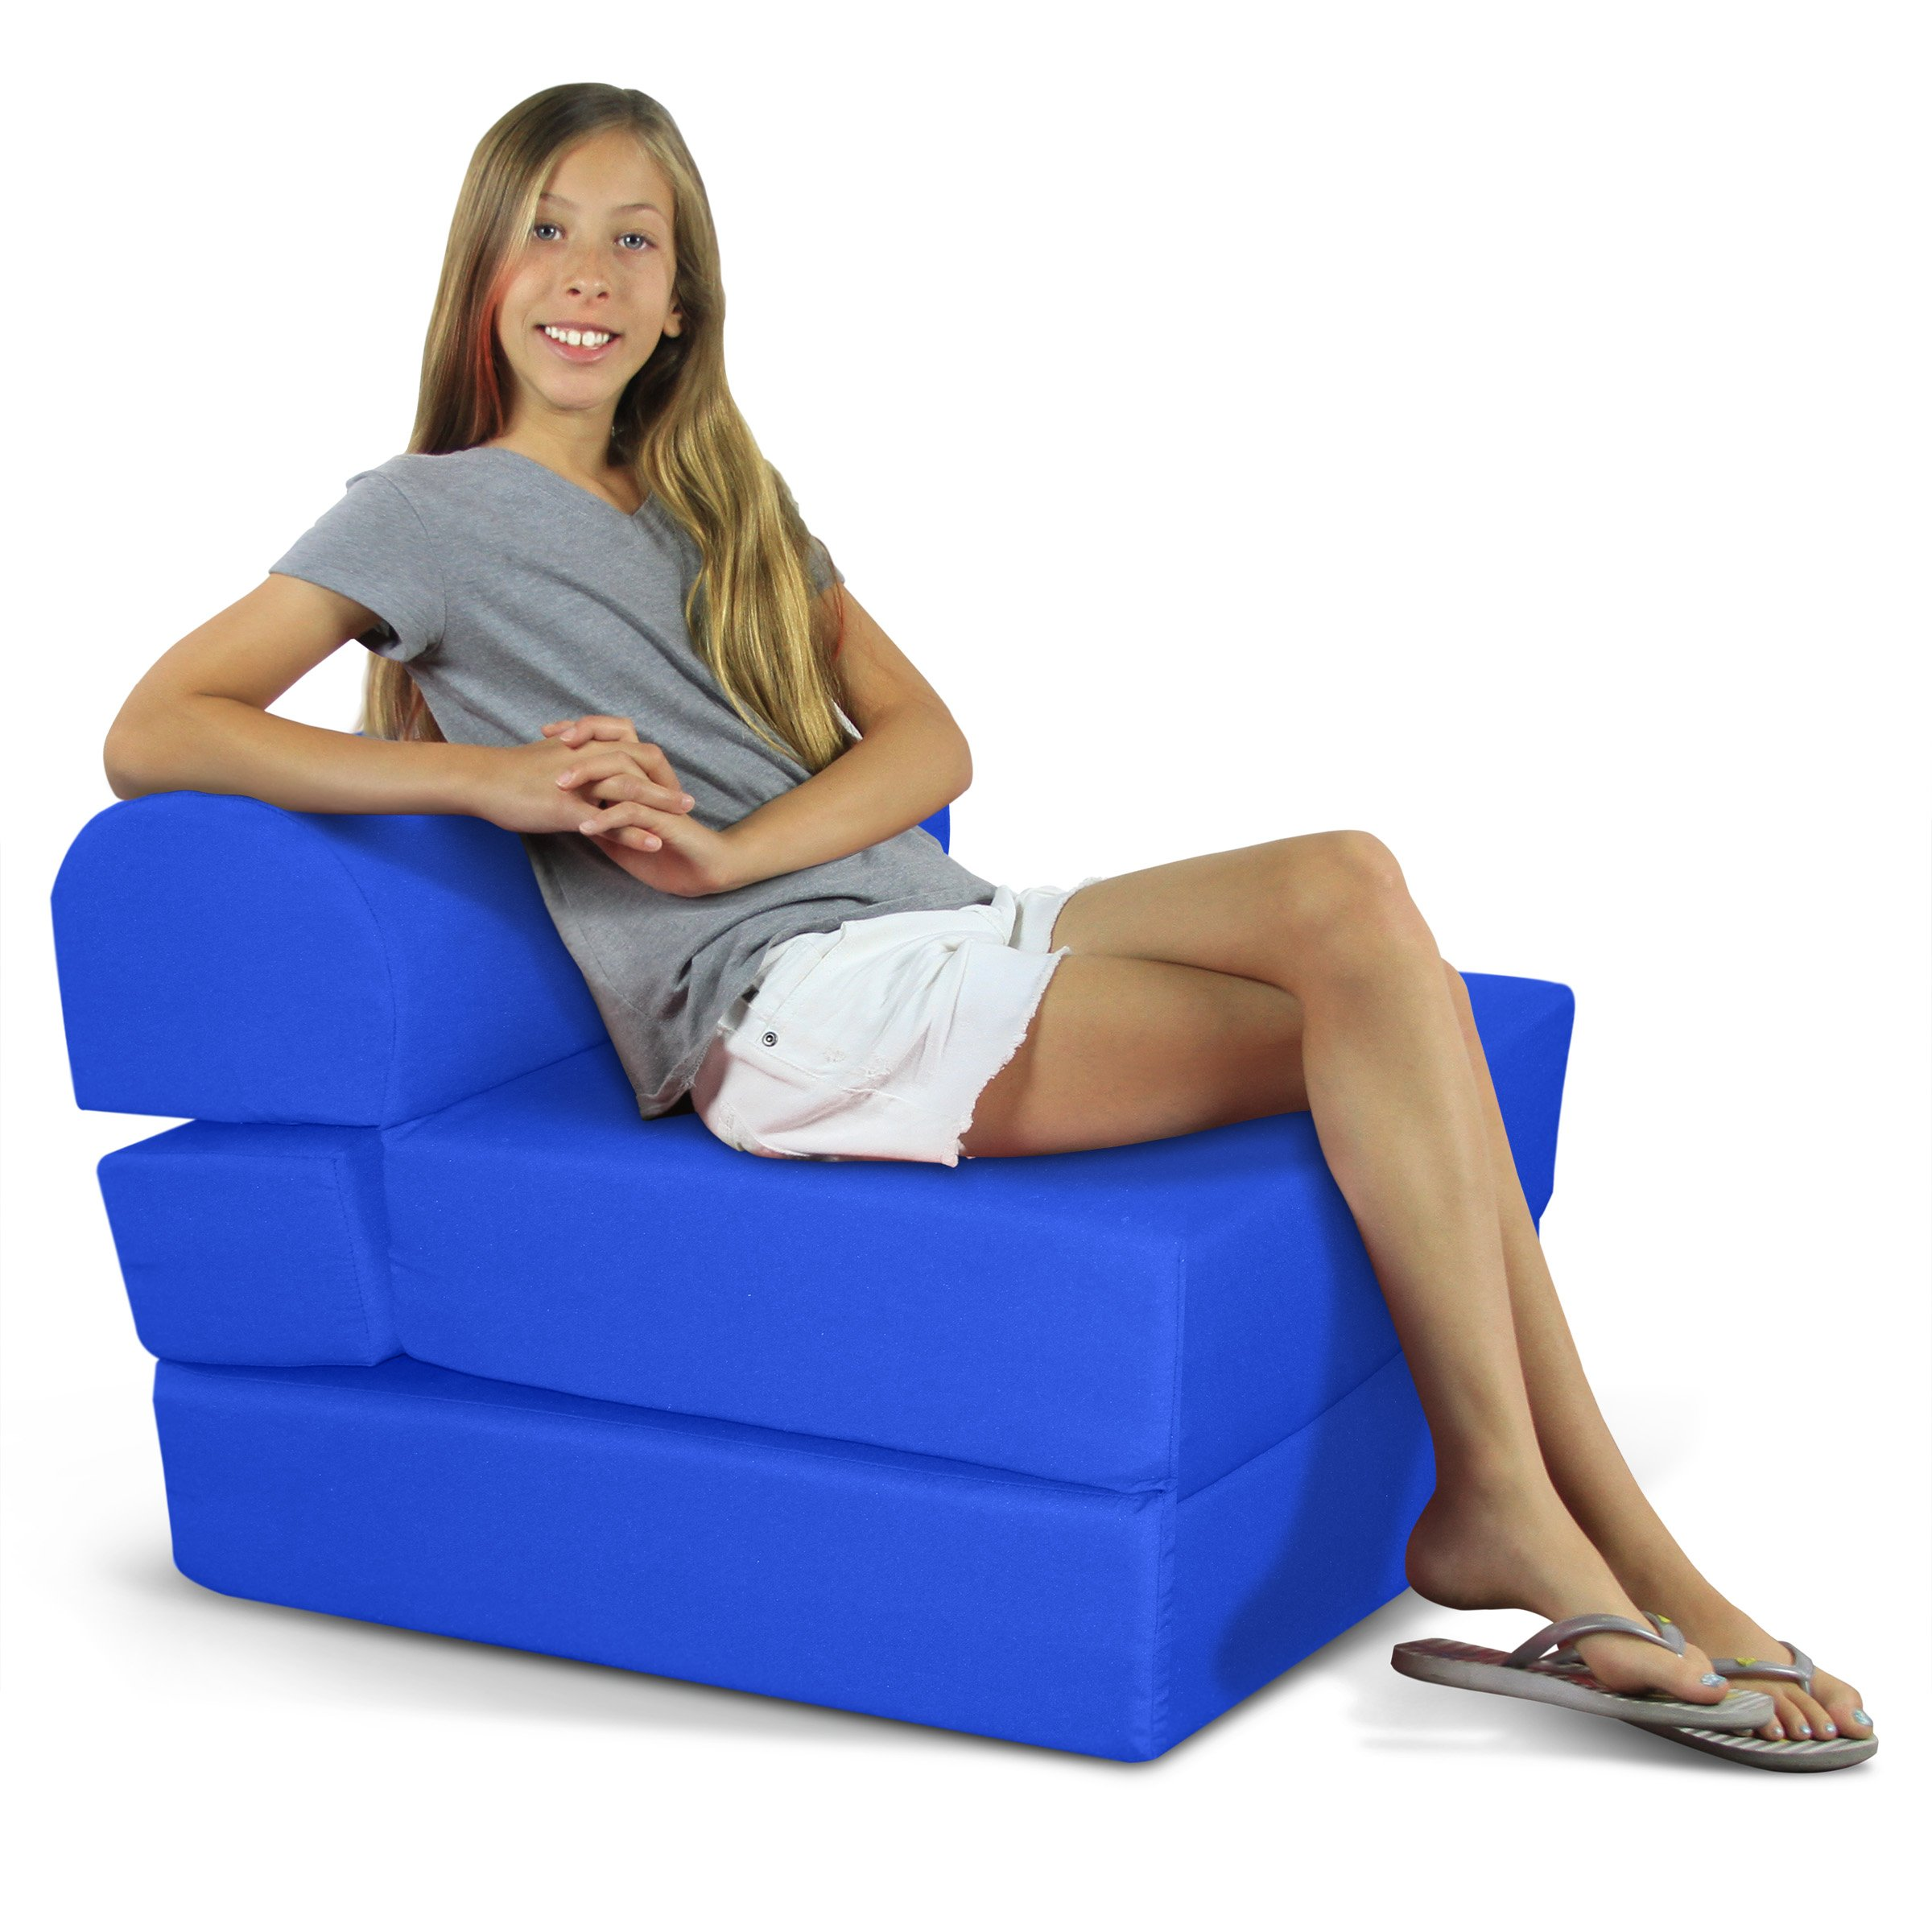 Children's Studio Chair Sleeper  Jr. Twin 24'', Royal Blue